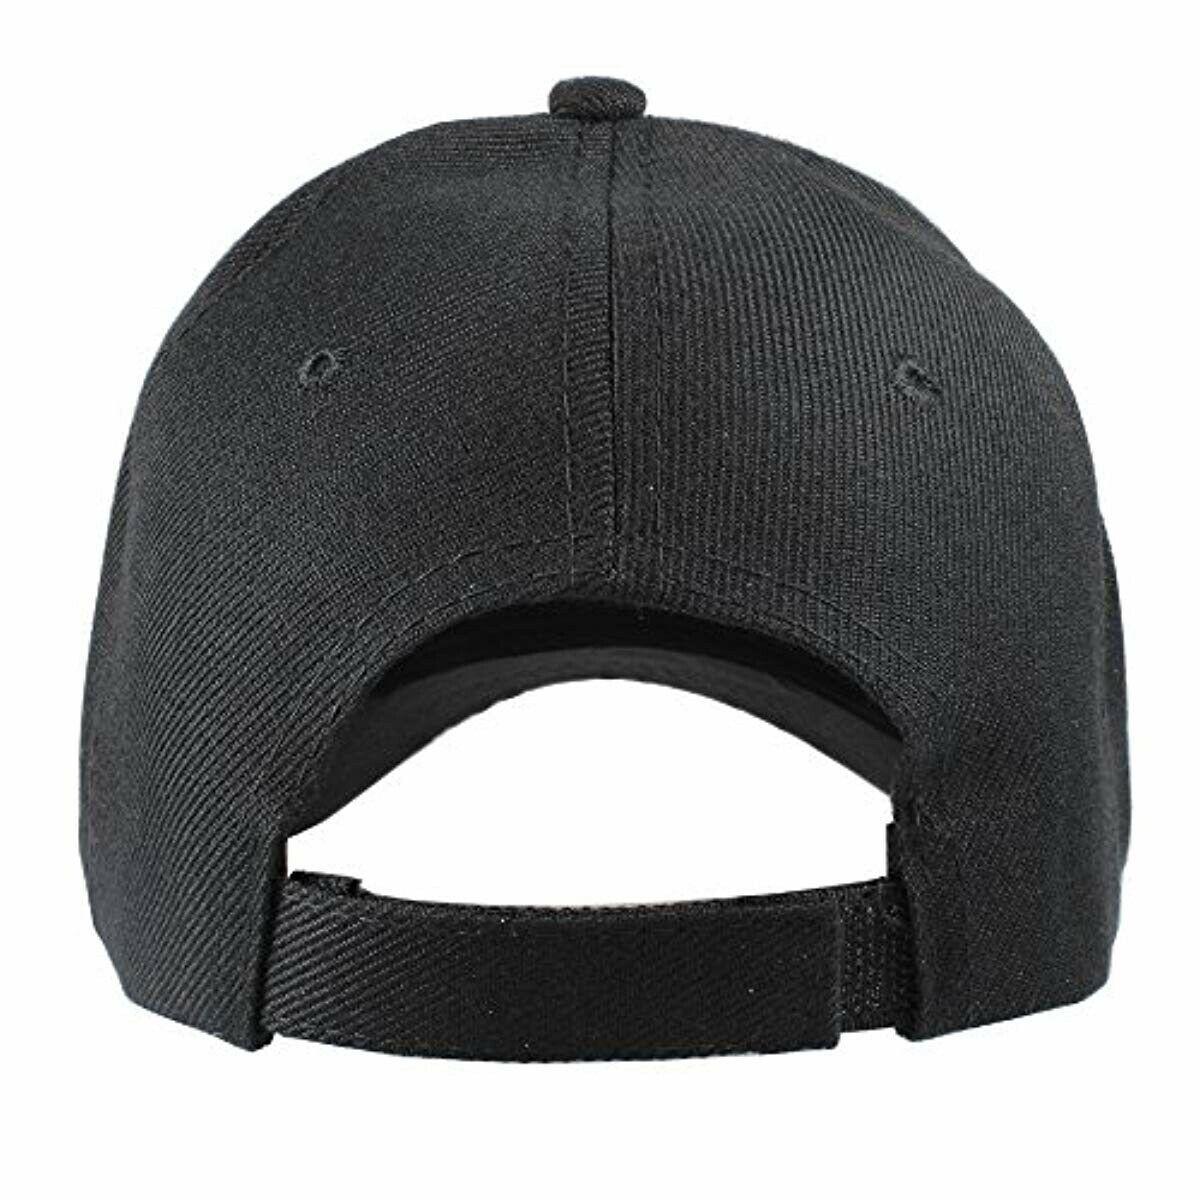 561abcde19c Gelante Plain Blank Baseball Caps Adjustable Back Strap Wholesale LOT 12  PC S